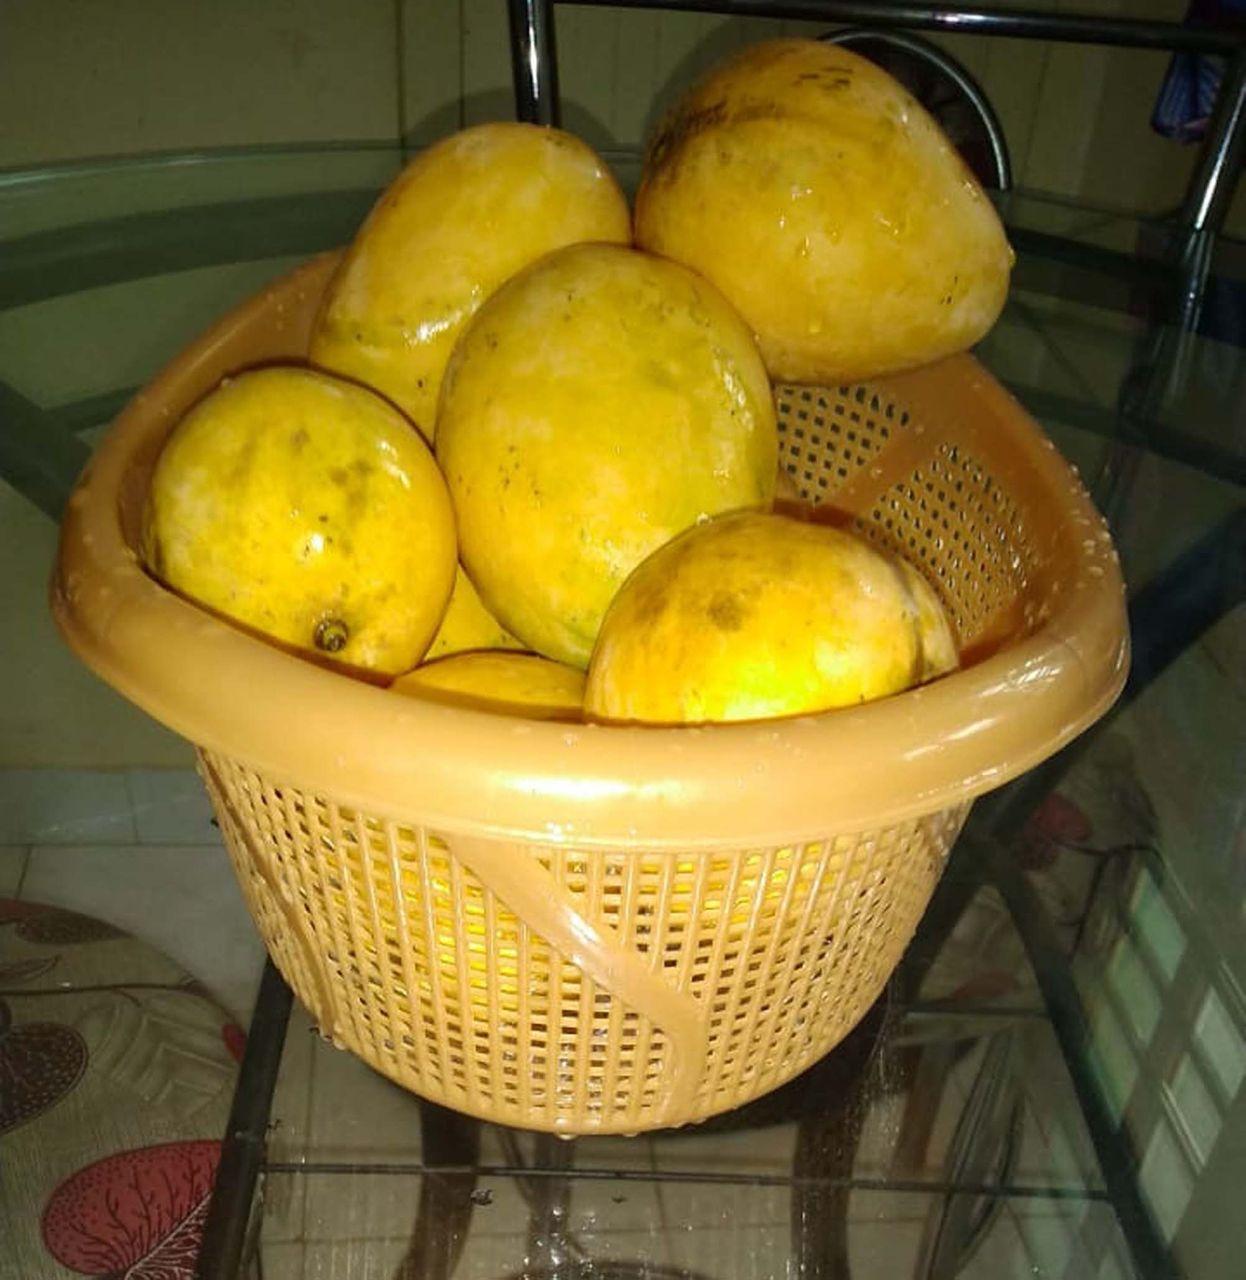 upload 2 mango.jpg